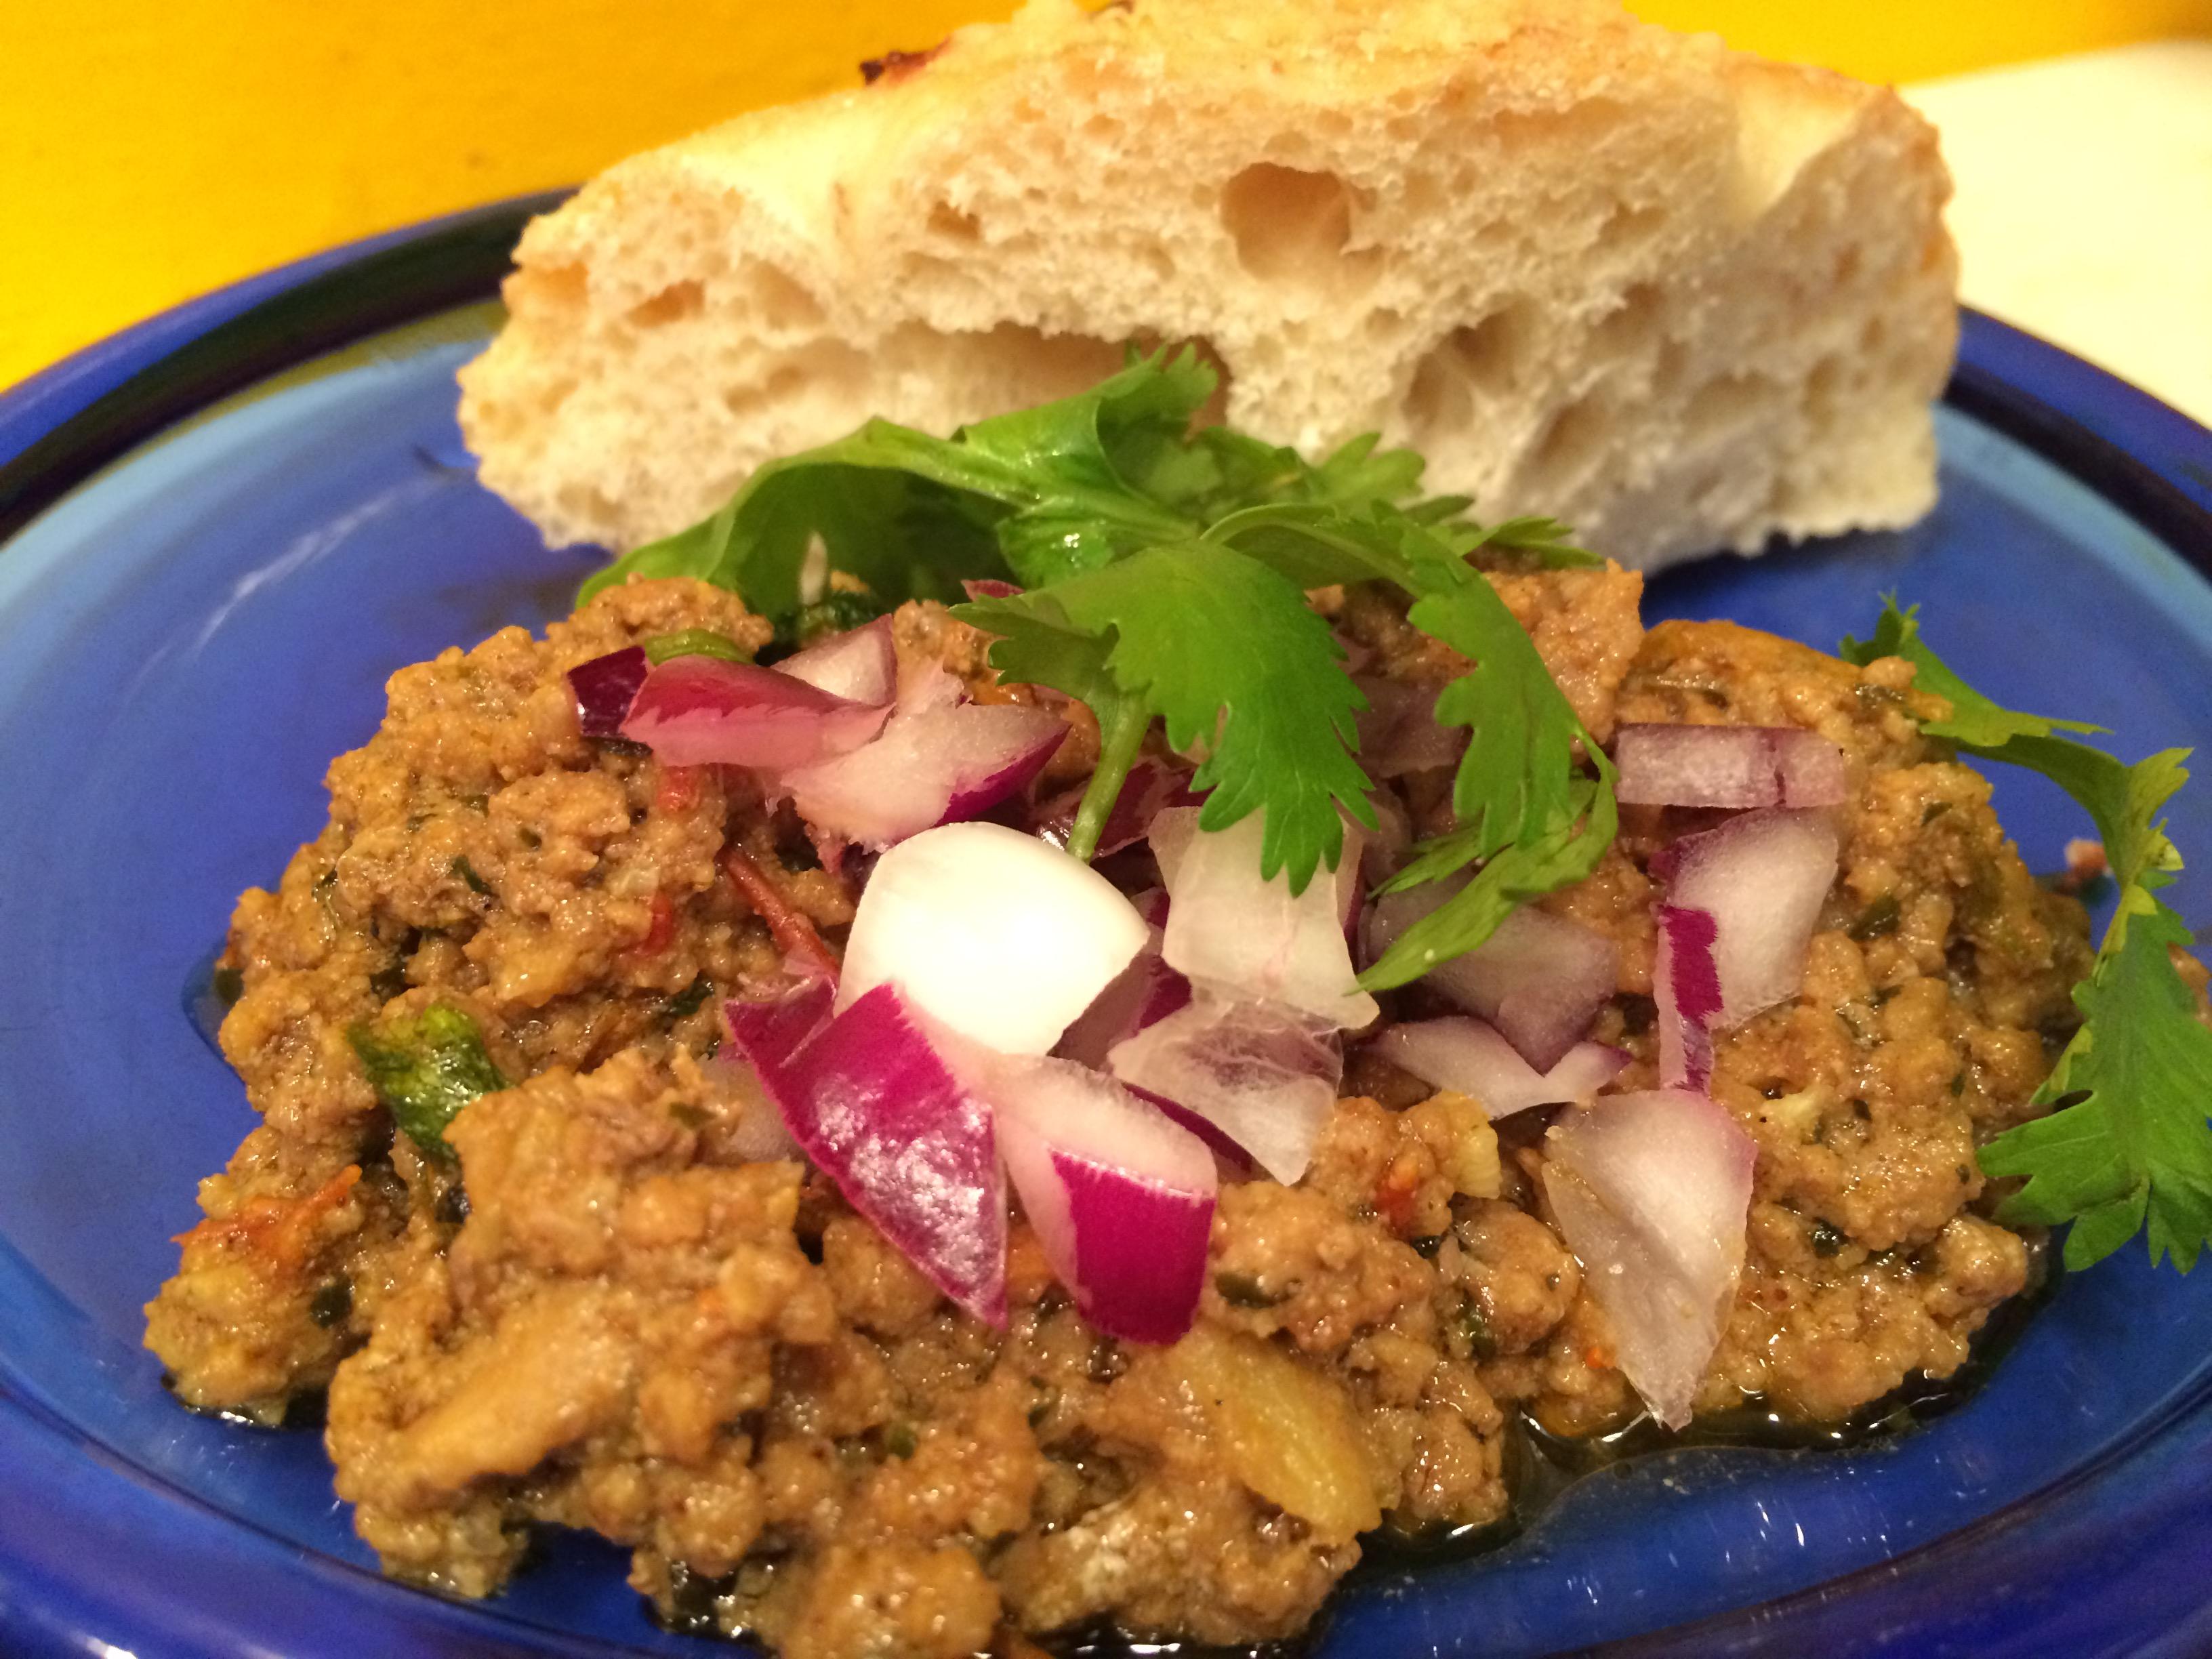 Kheema Pav / Spiced Ground Meat